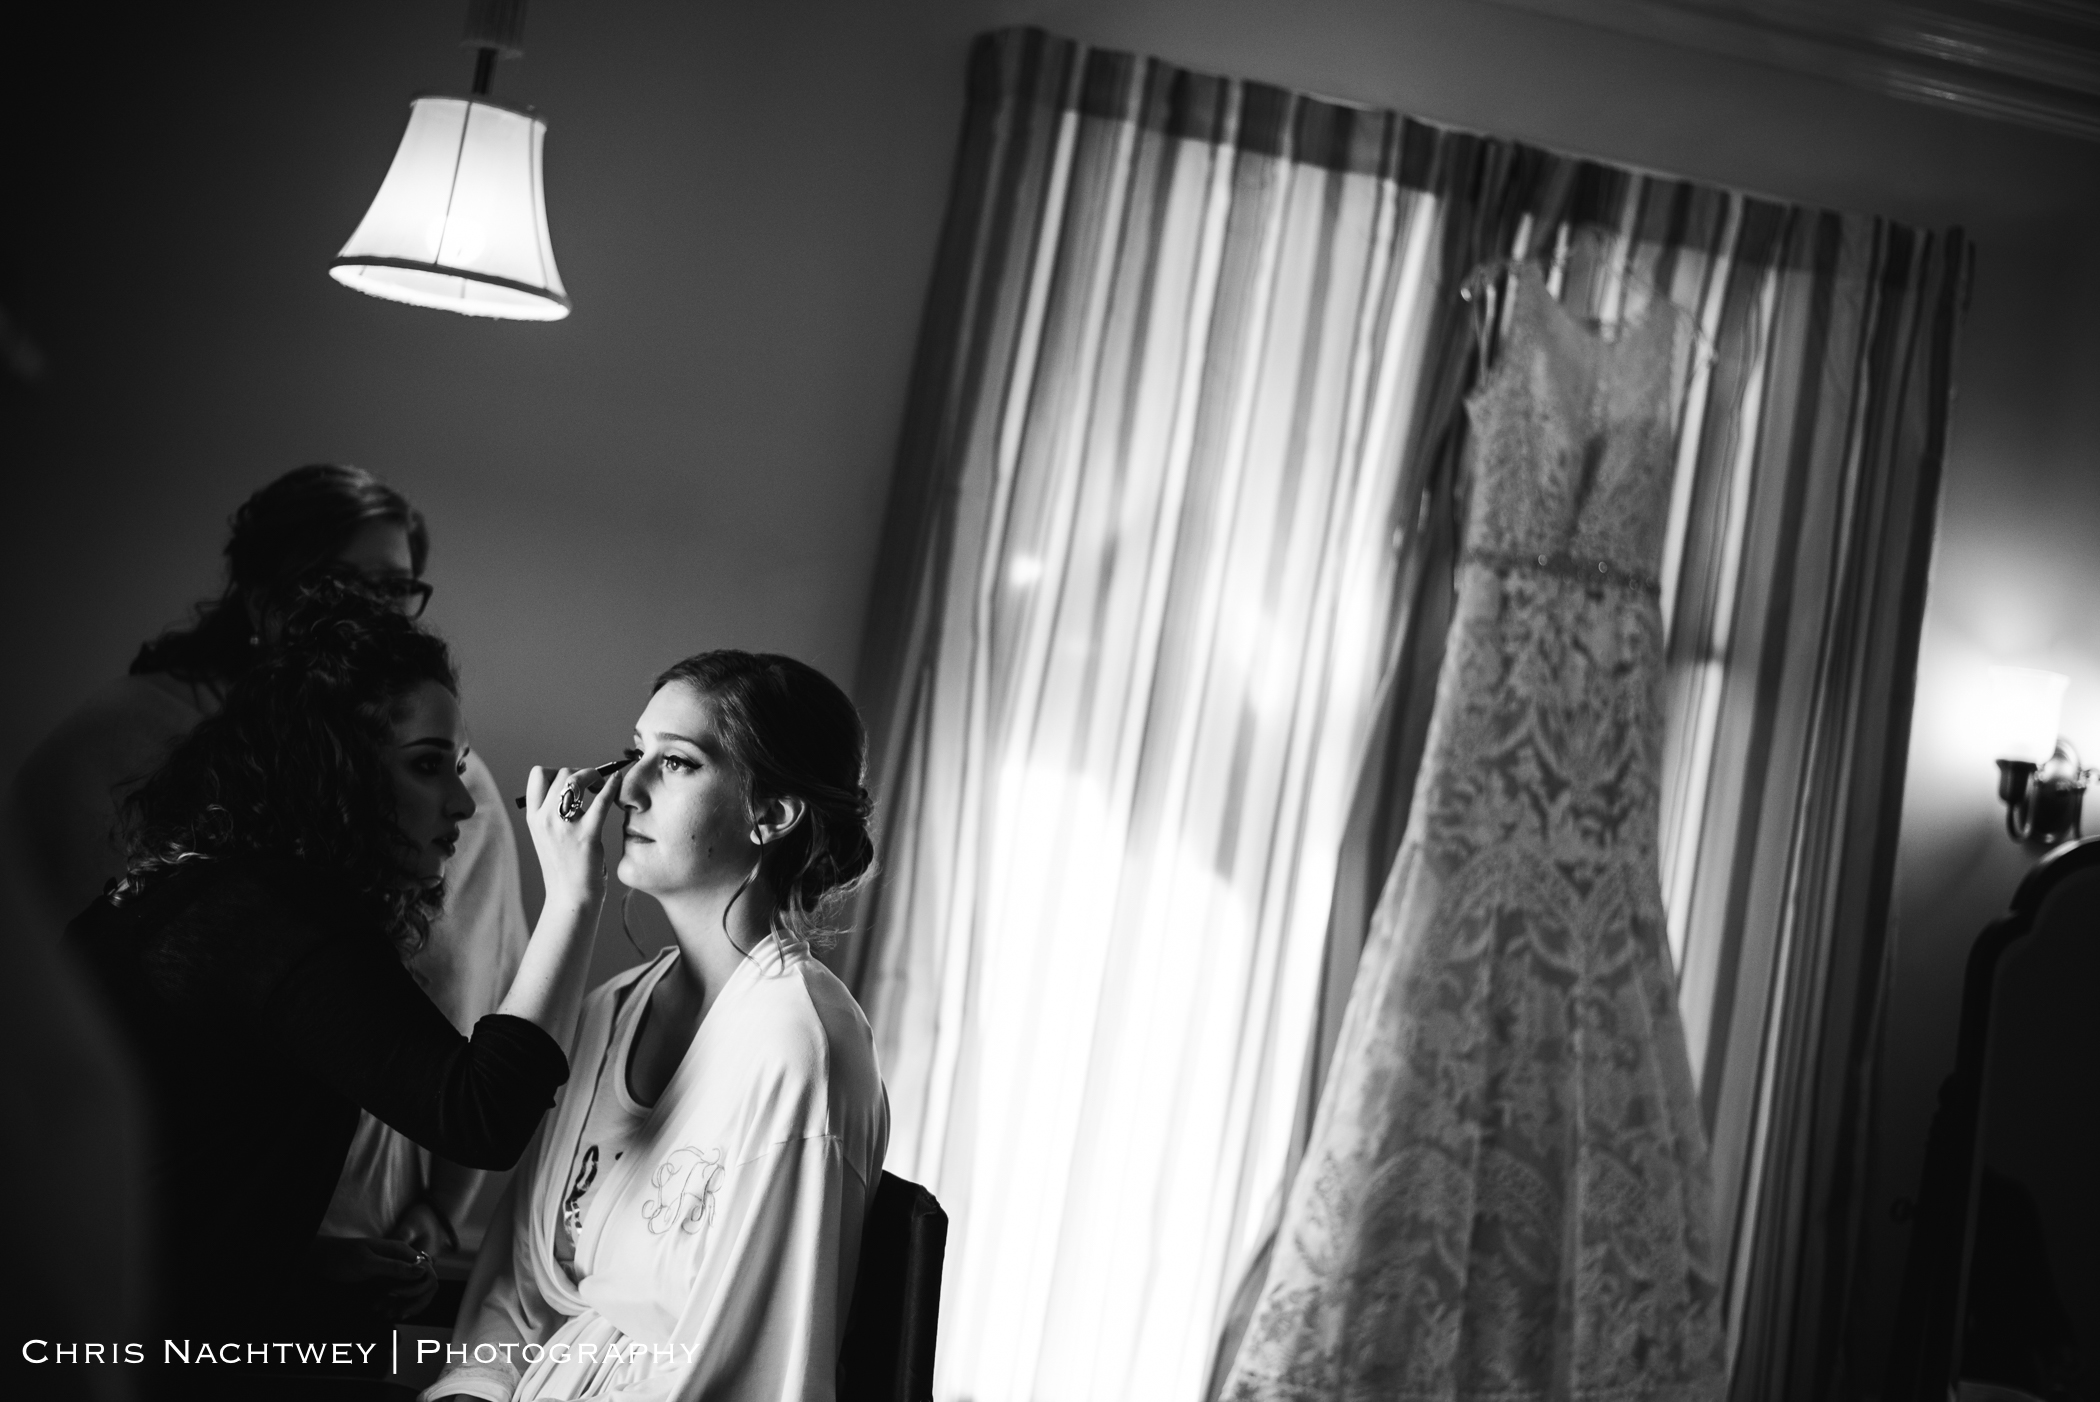 harkness-wedding-photos-chris-nachtwey-photography-2018-6.jpg